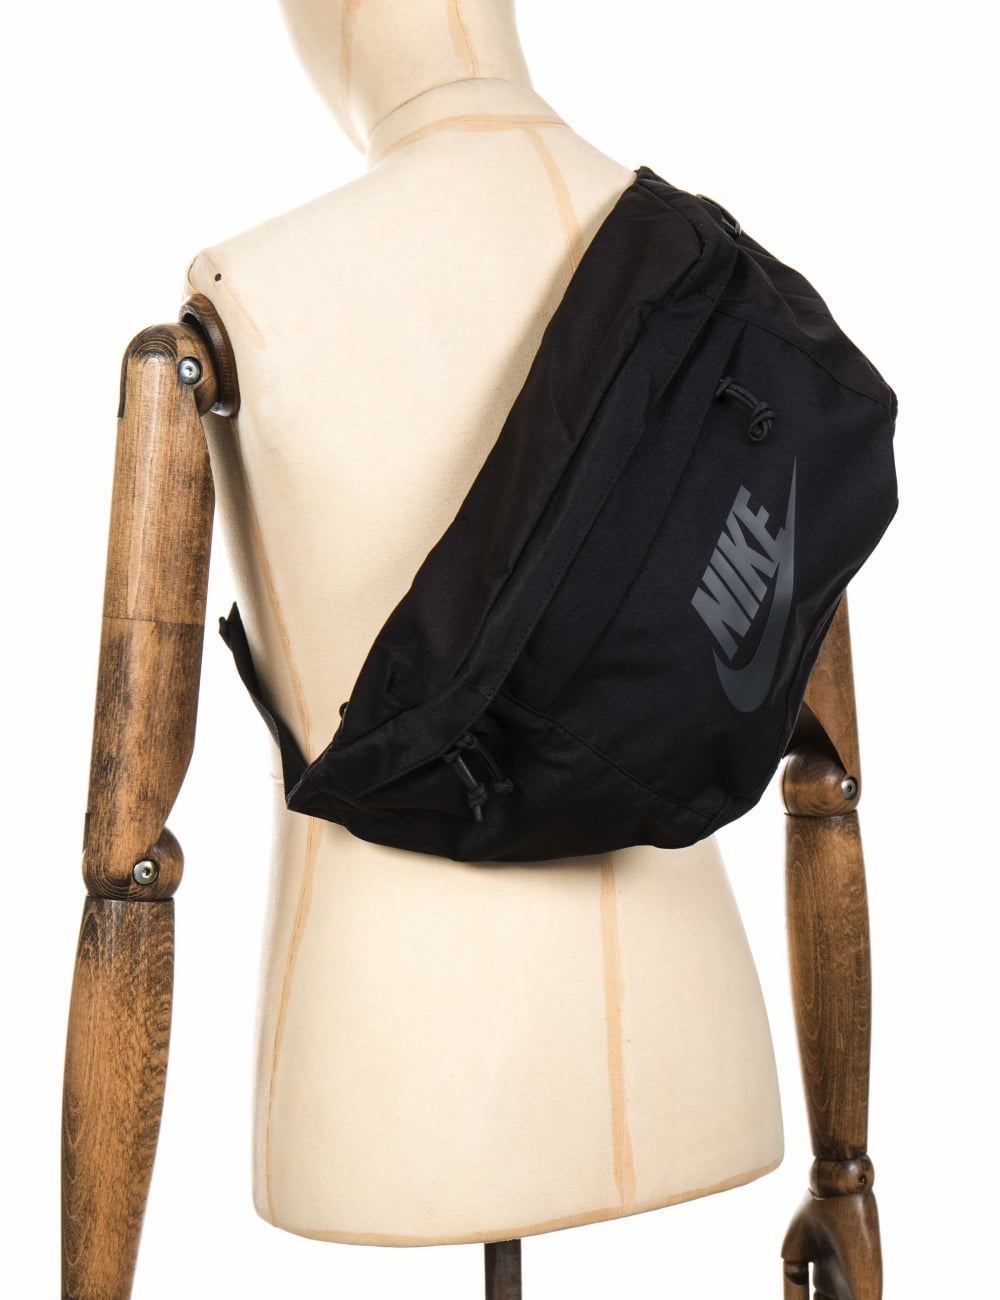 4eb9275d829f Nike Hip Pack - Black Black - Accessories from Fat Buddha Store UK